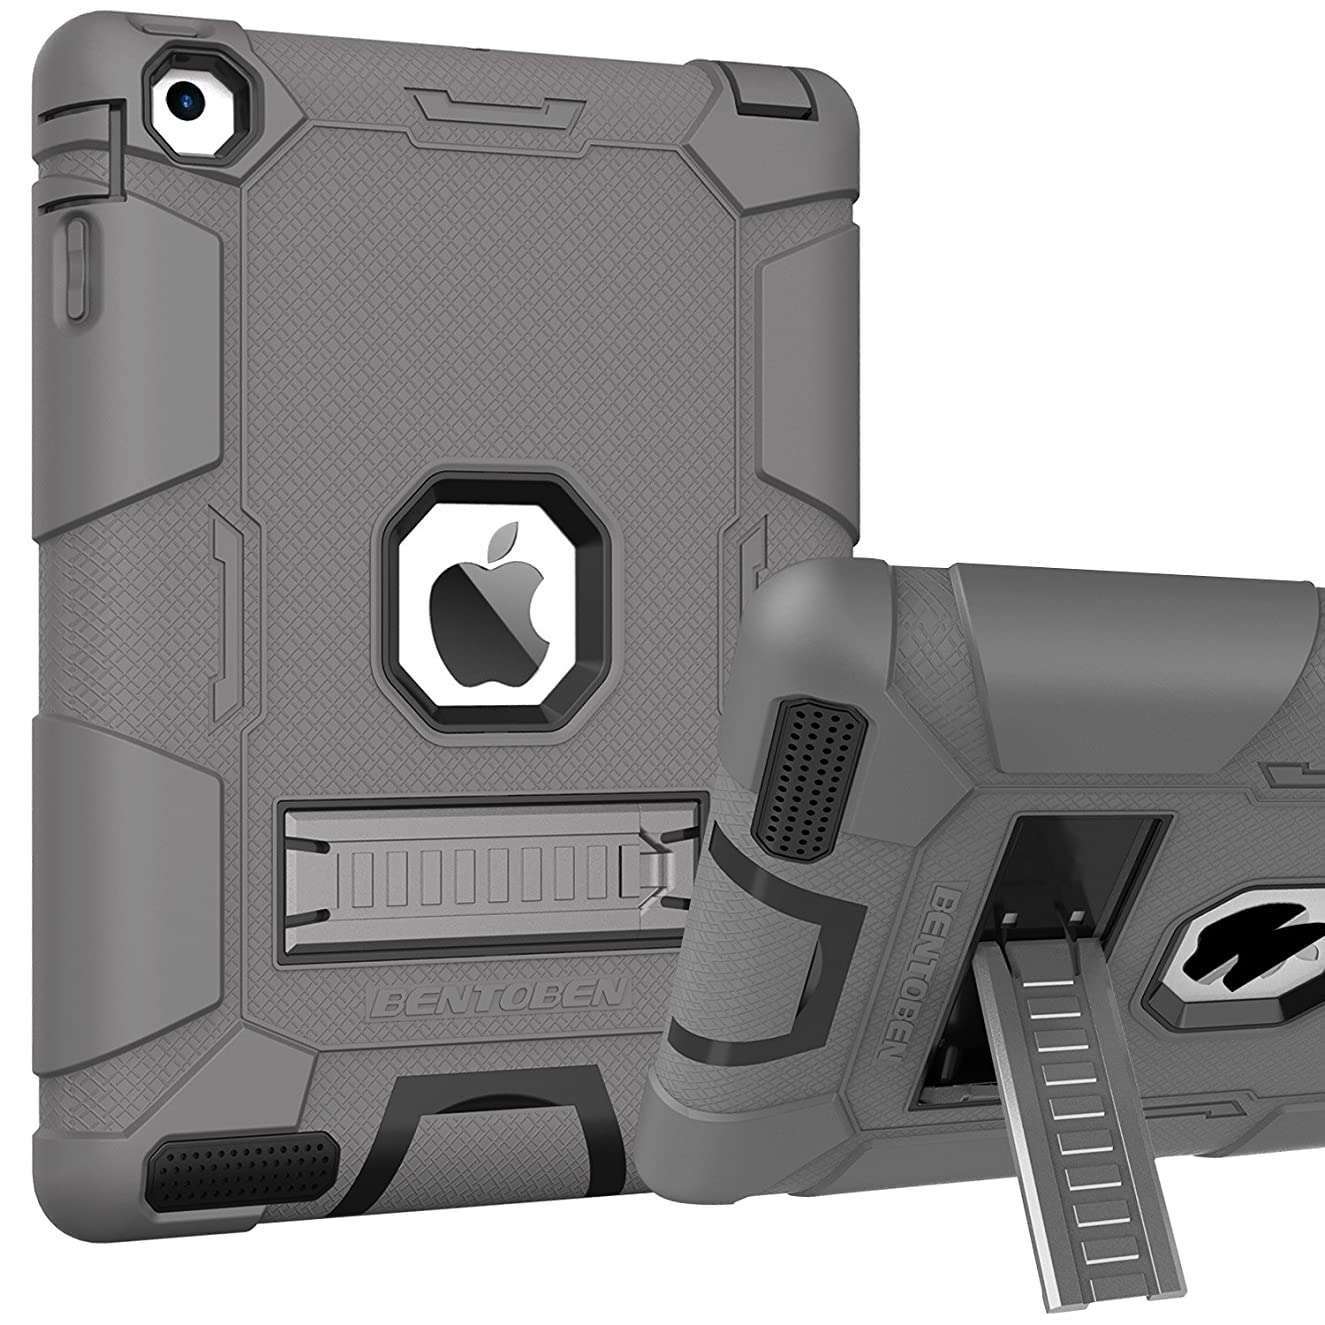 iPad 2 Case, iPad 4 Case,iPad 3 Case,BENTOBEN Kickstand Three Layers Hybrid Heavy Duty Full Body Rugged Shockproof Drop Resistance Anti-slip Protective Case Cover for iPad 2/3/4 Retina,Dark Gray/Black